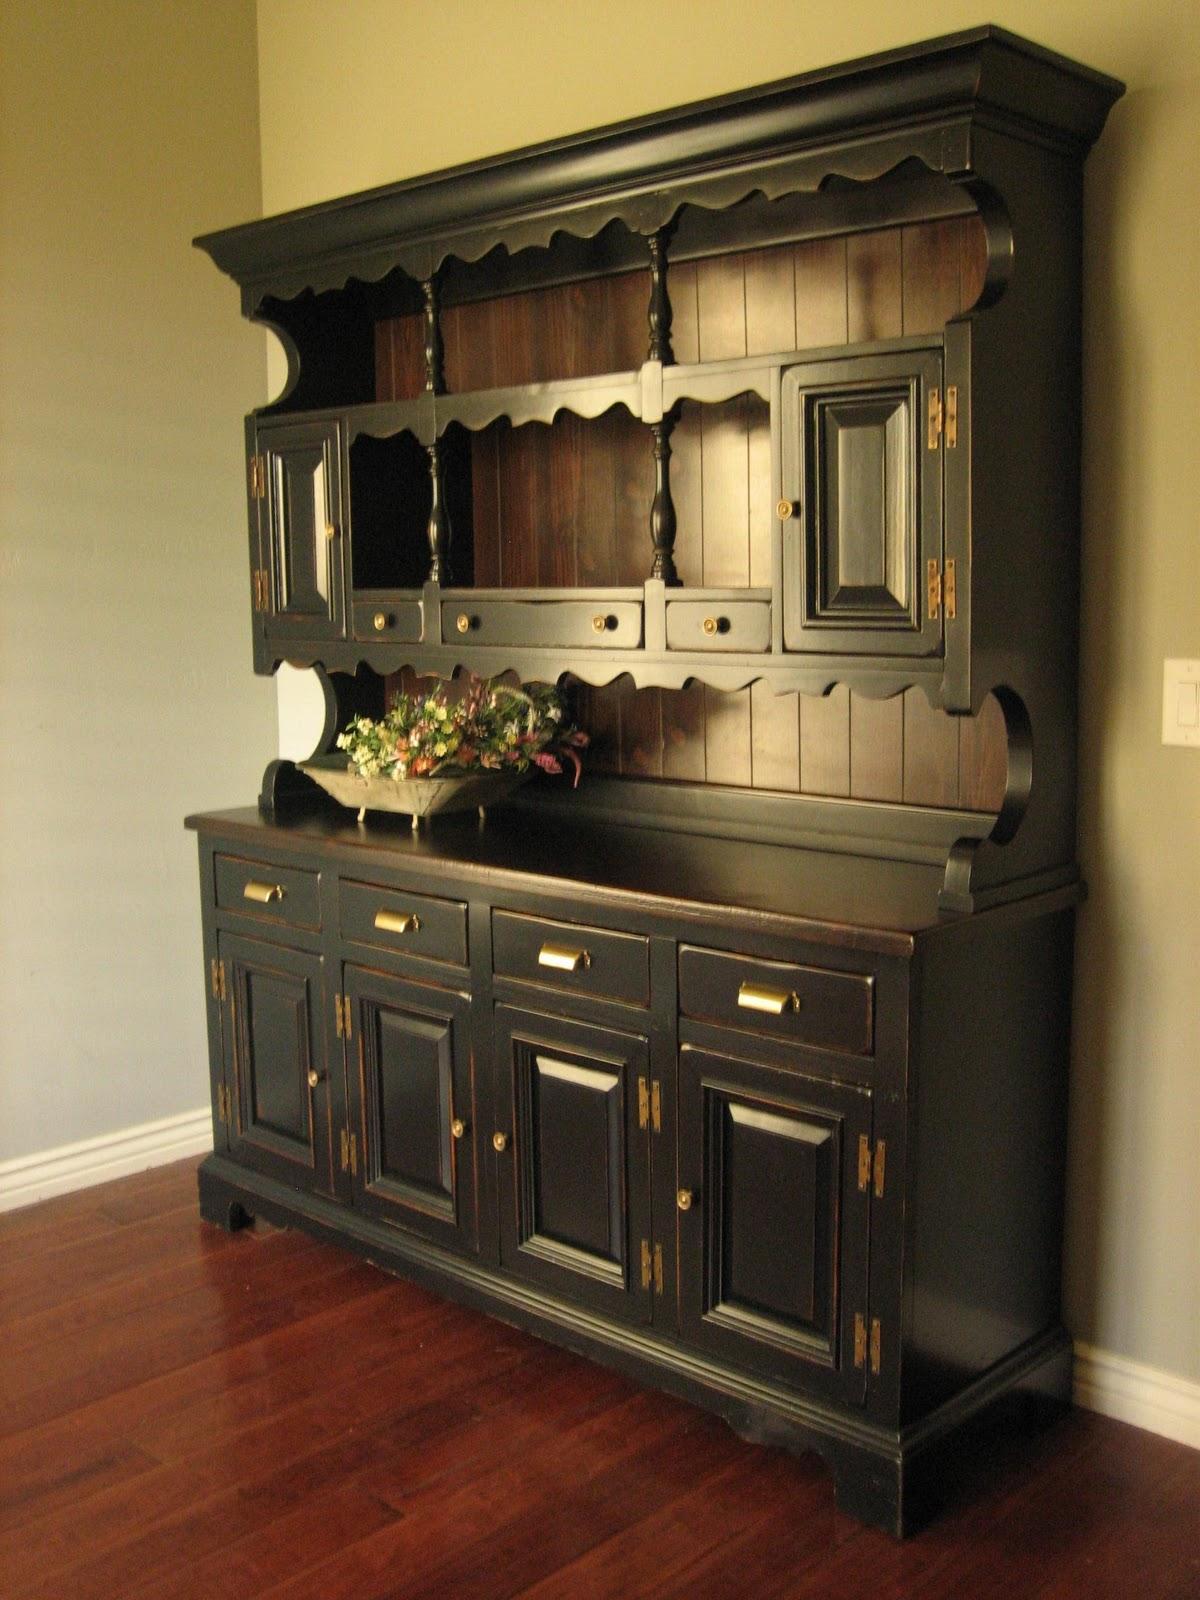 Dining Room Hutches Small Hutch Furniture Room Furniture: Rustic Black Farmhouse Hutch